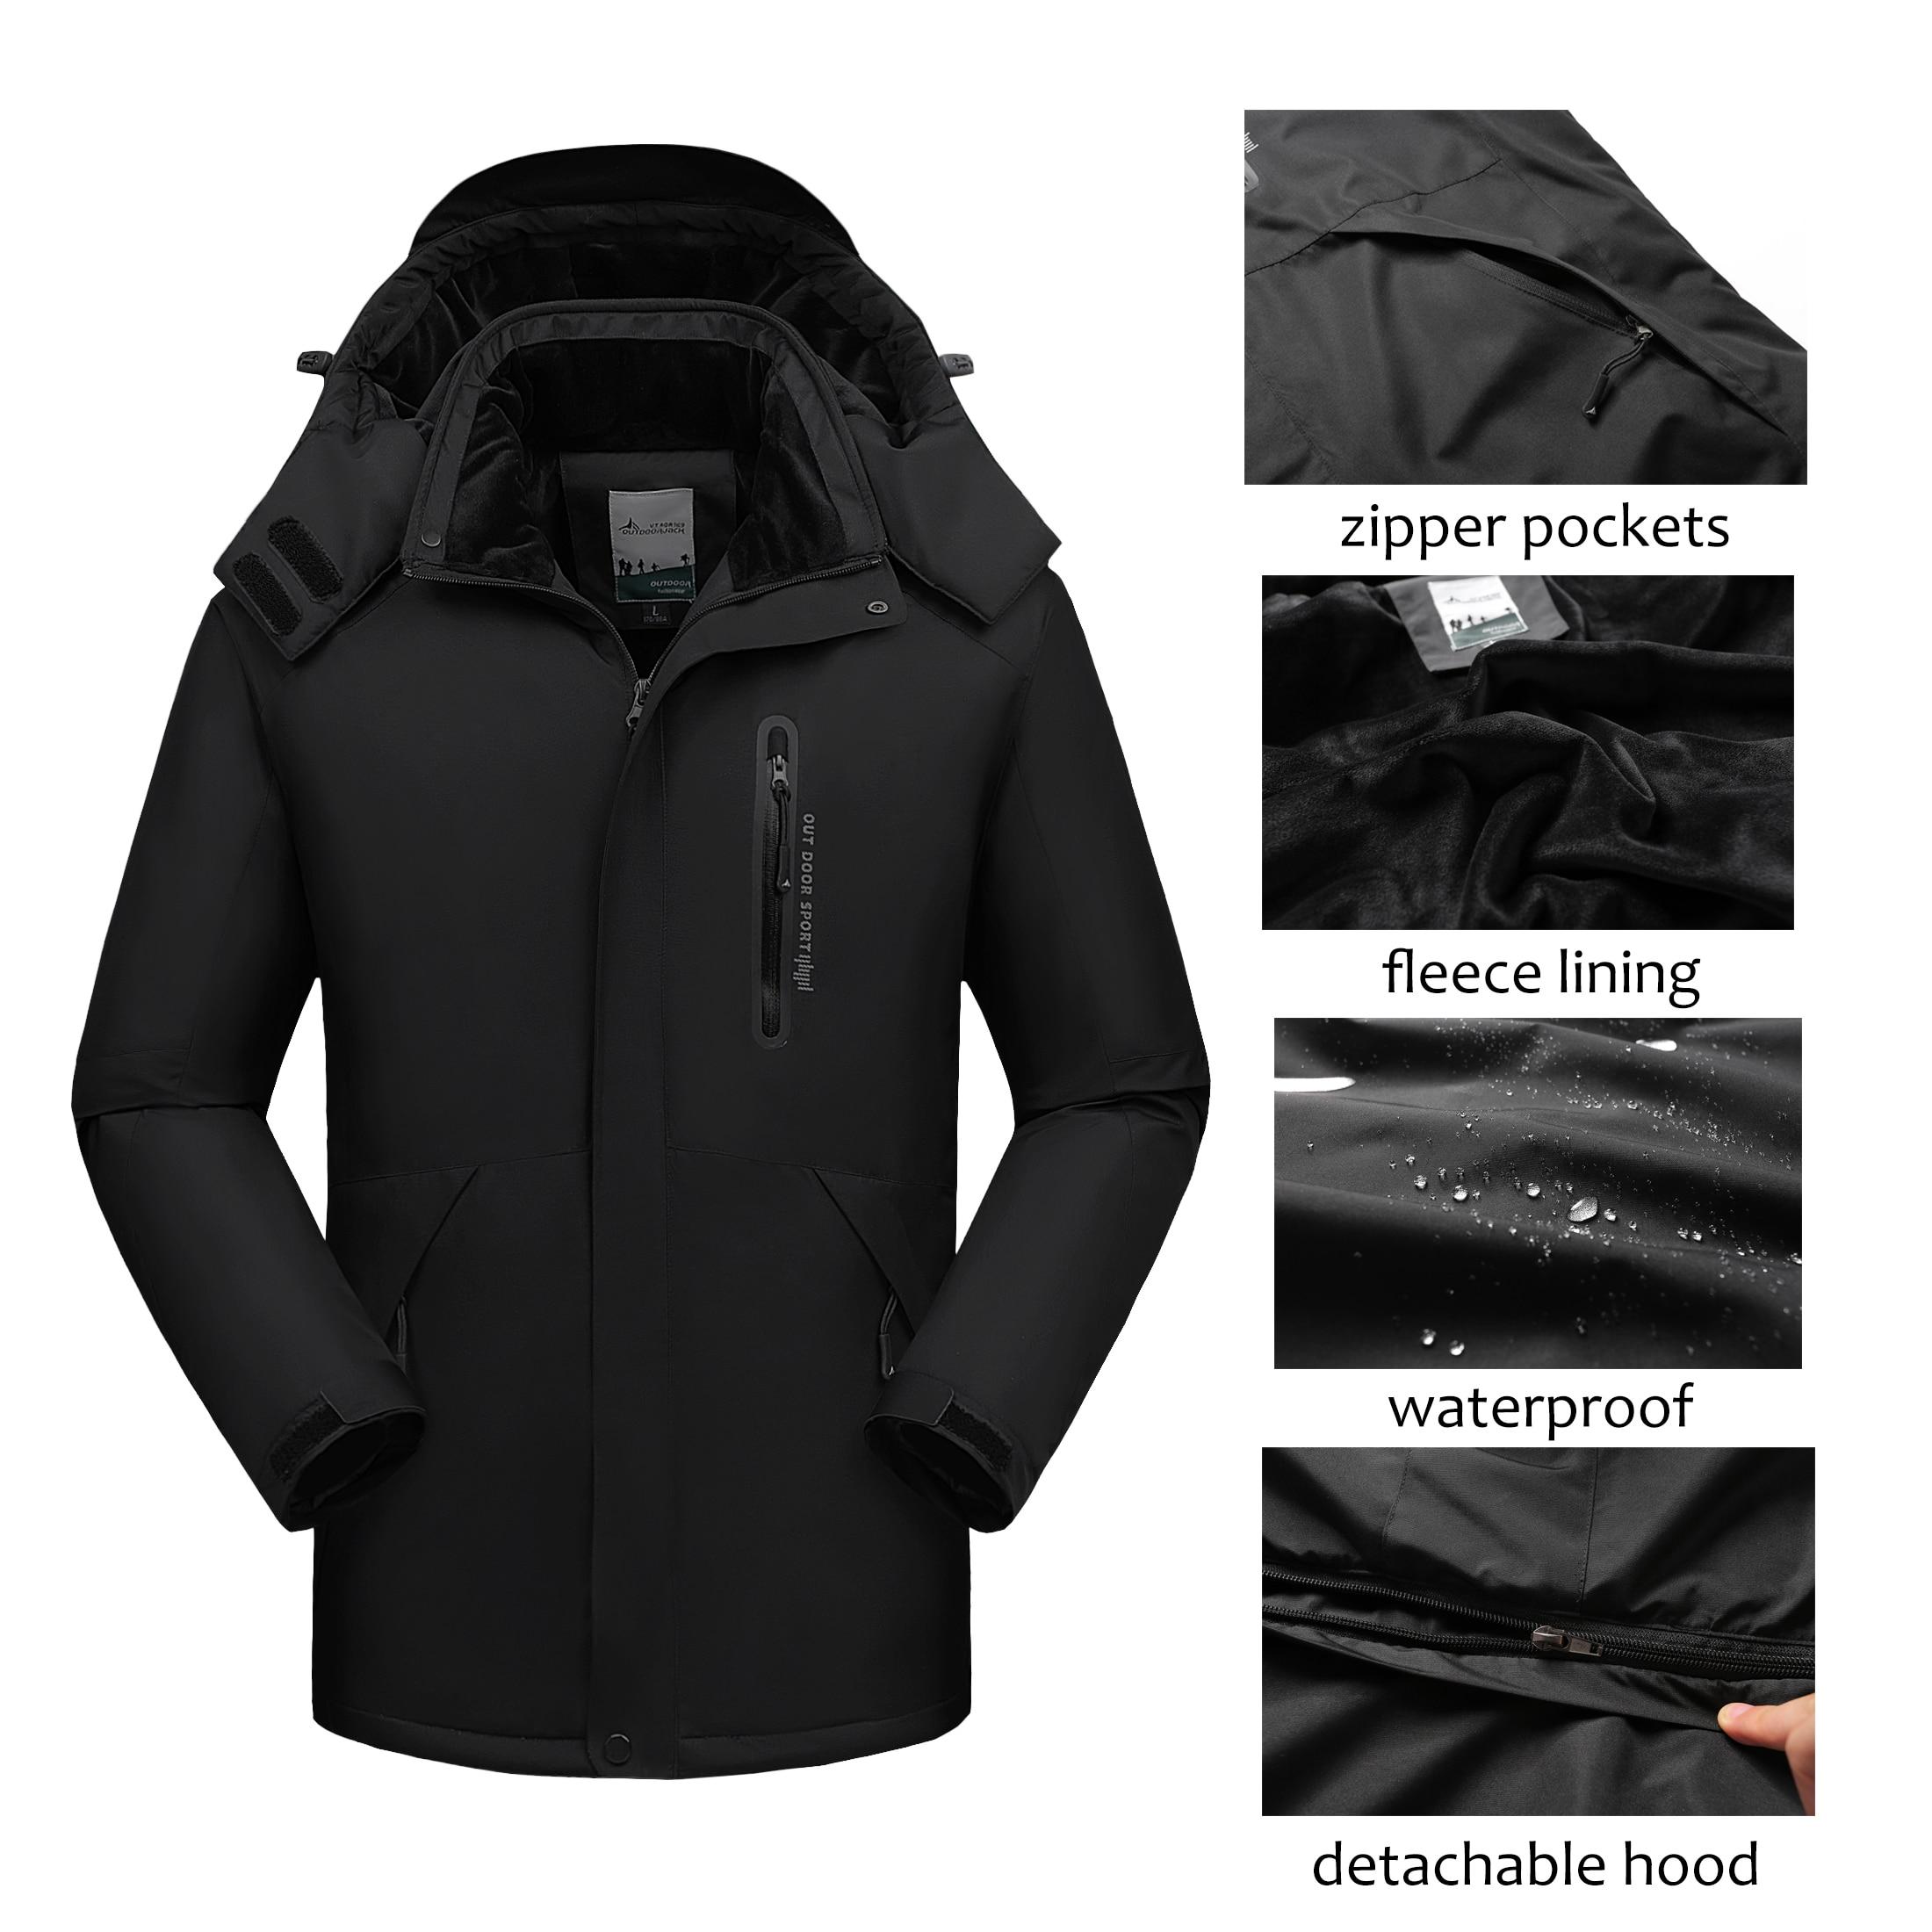 Chaqueta de invierno para hombre impermeable con capucha cortavientos para hombre grueso cálido Parkas chaqueta de abrigo de lana Hombre de talla grande 7XL 8XL 9XL Dropshipping